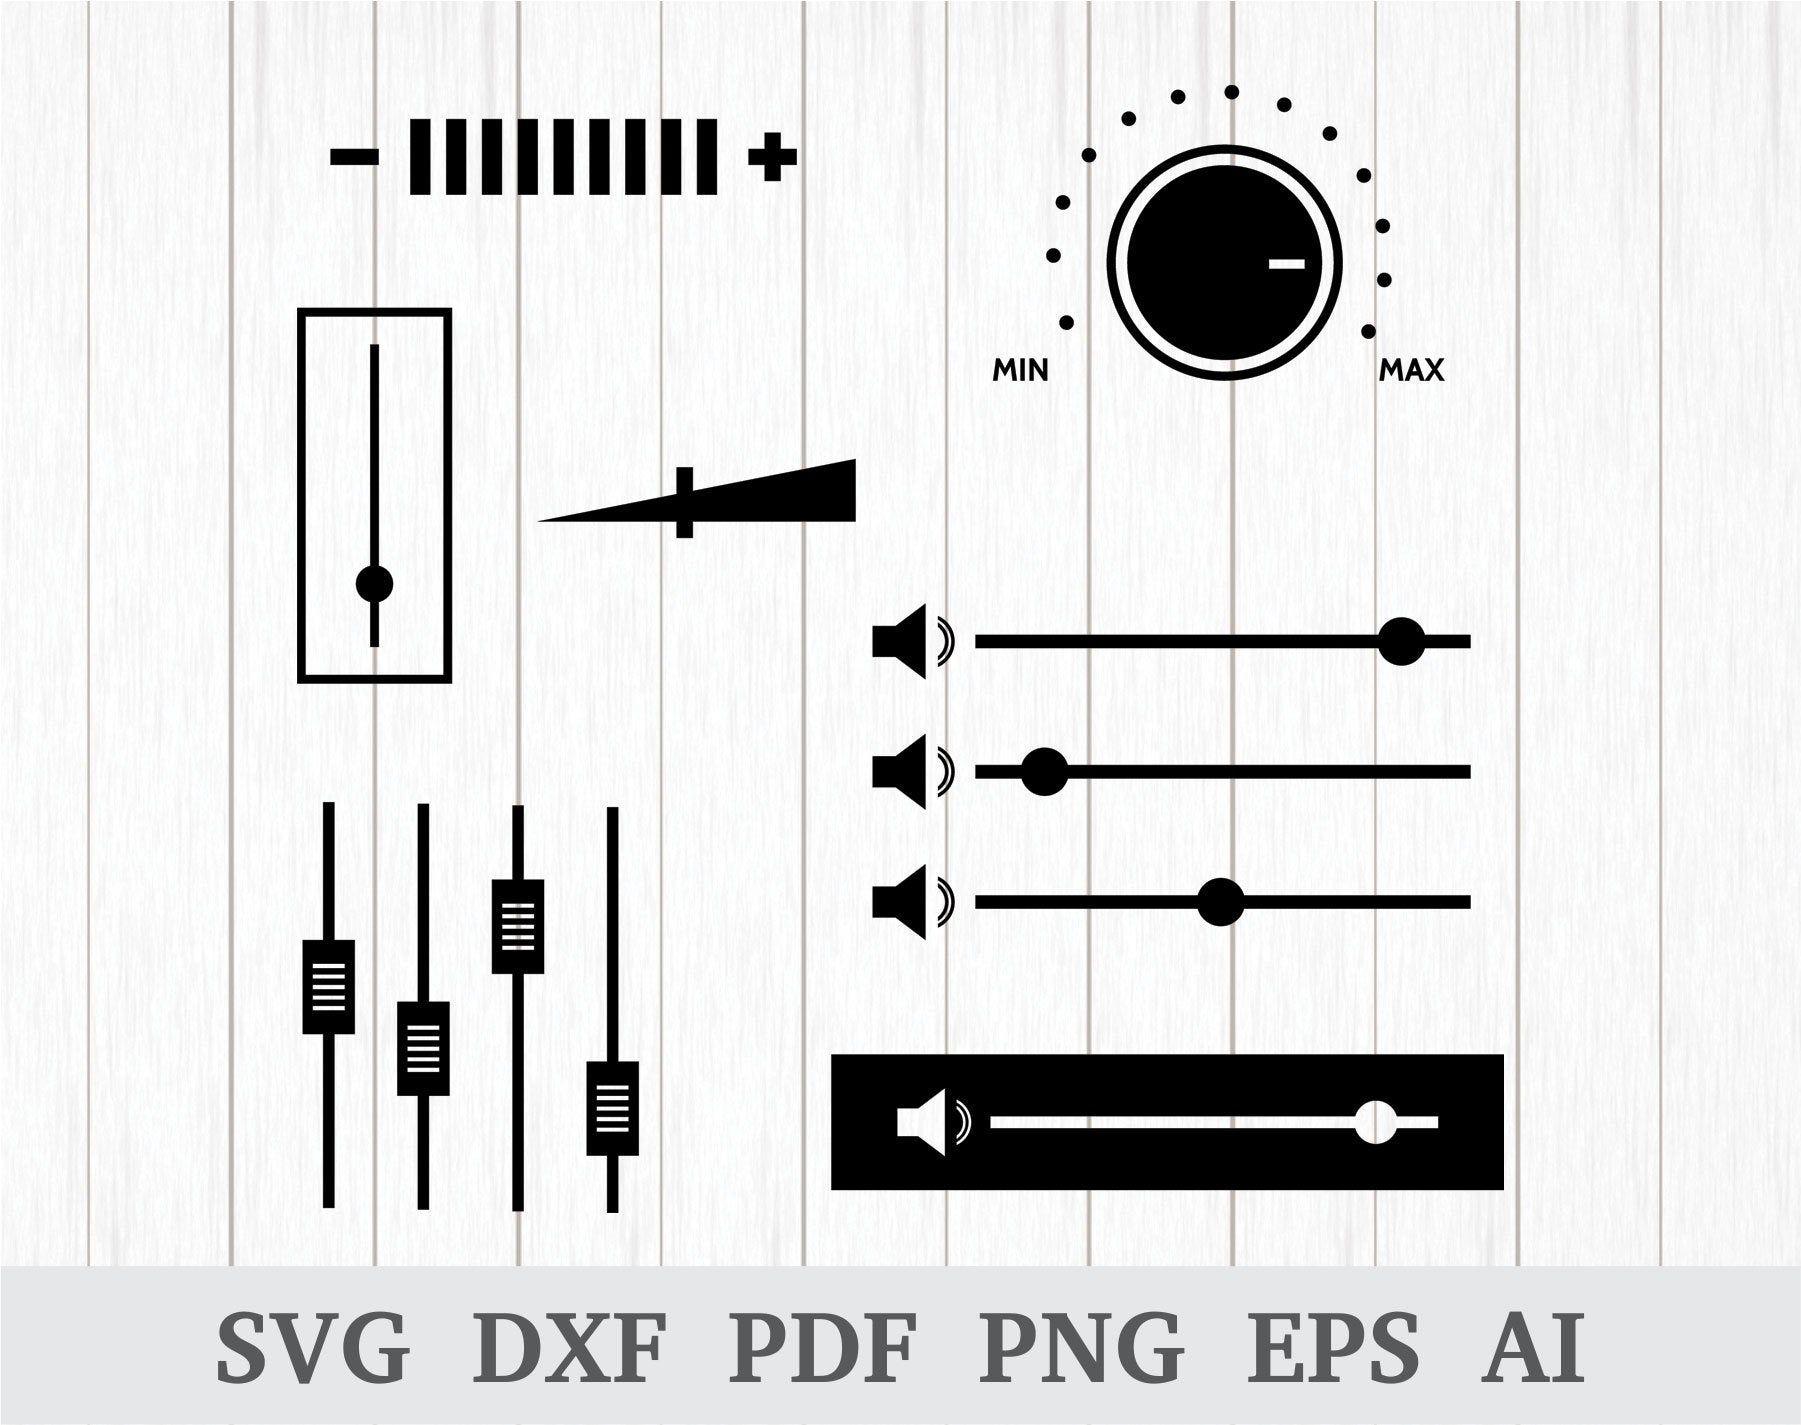 Volume svg, Volume levels svg, Volume slider svg, Audio/sound svg, volume slider